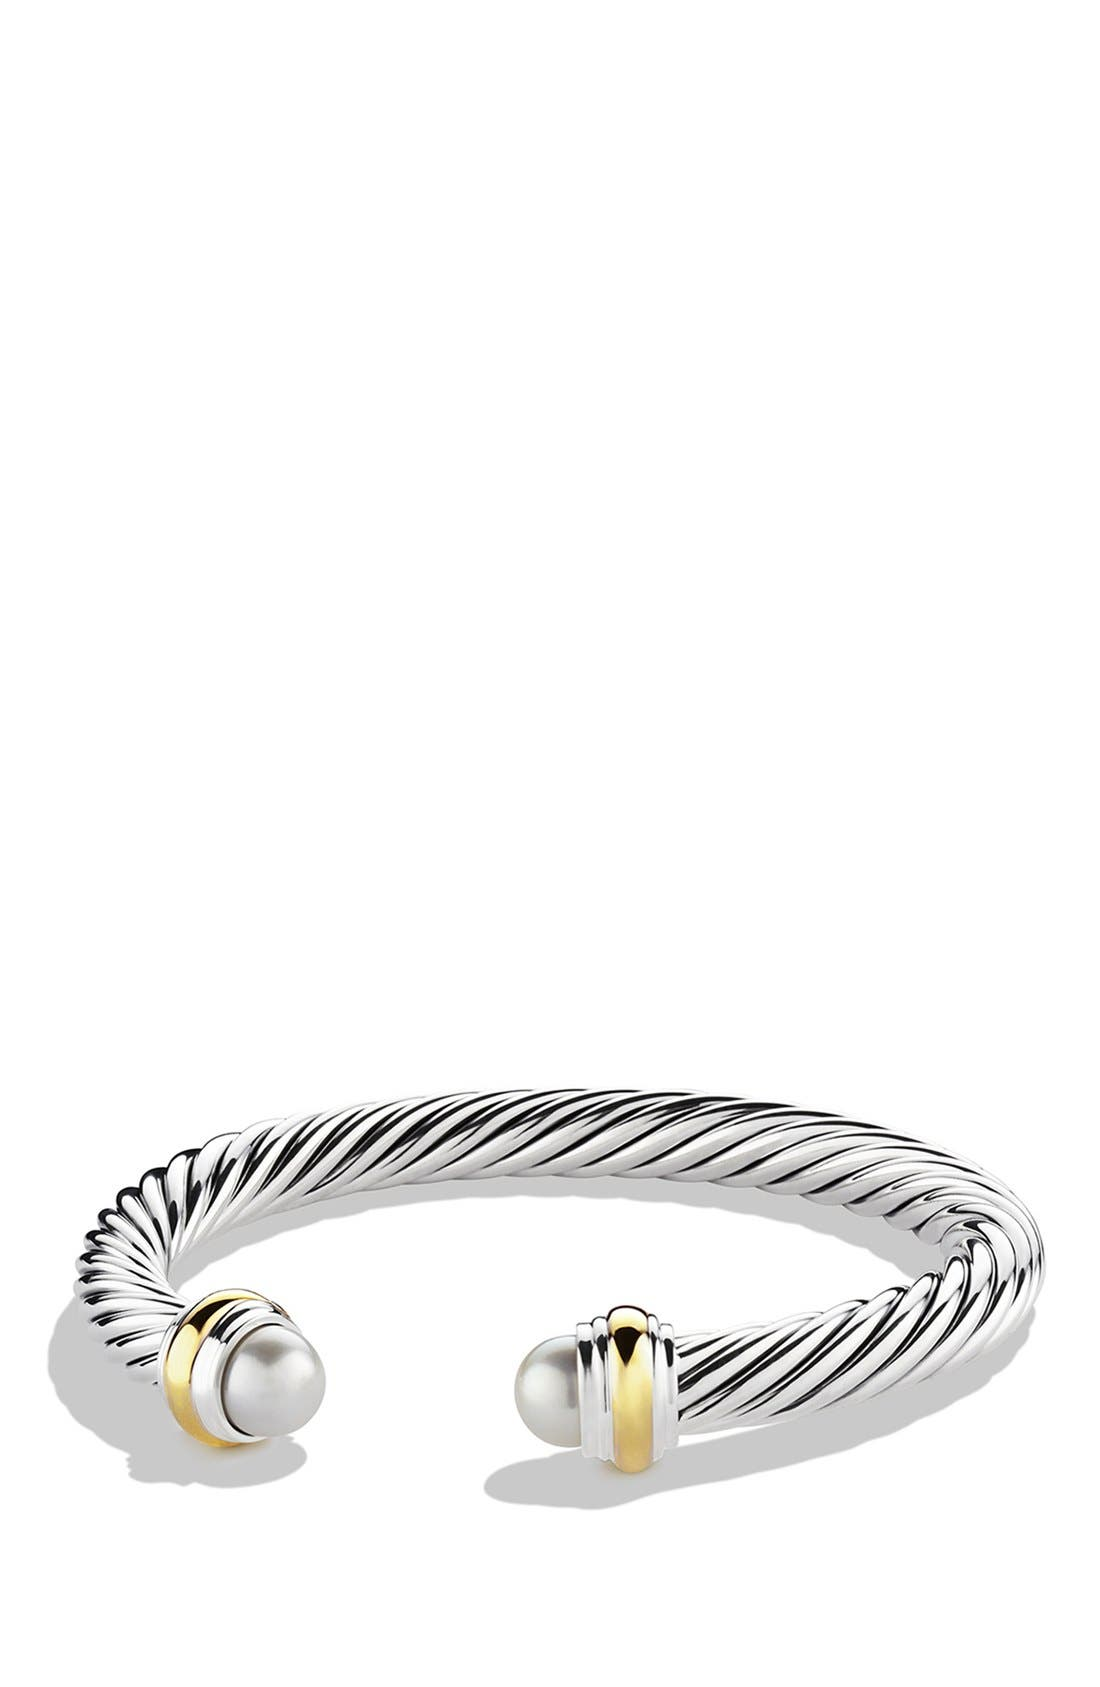 Alternate Image 1 Selected - David Yurman Cable Classics Bracelet with Semiprecious Stones